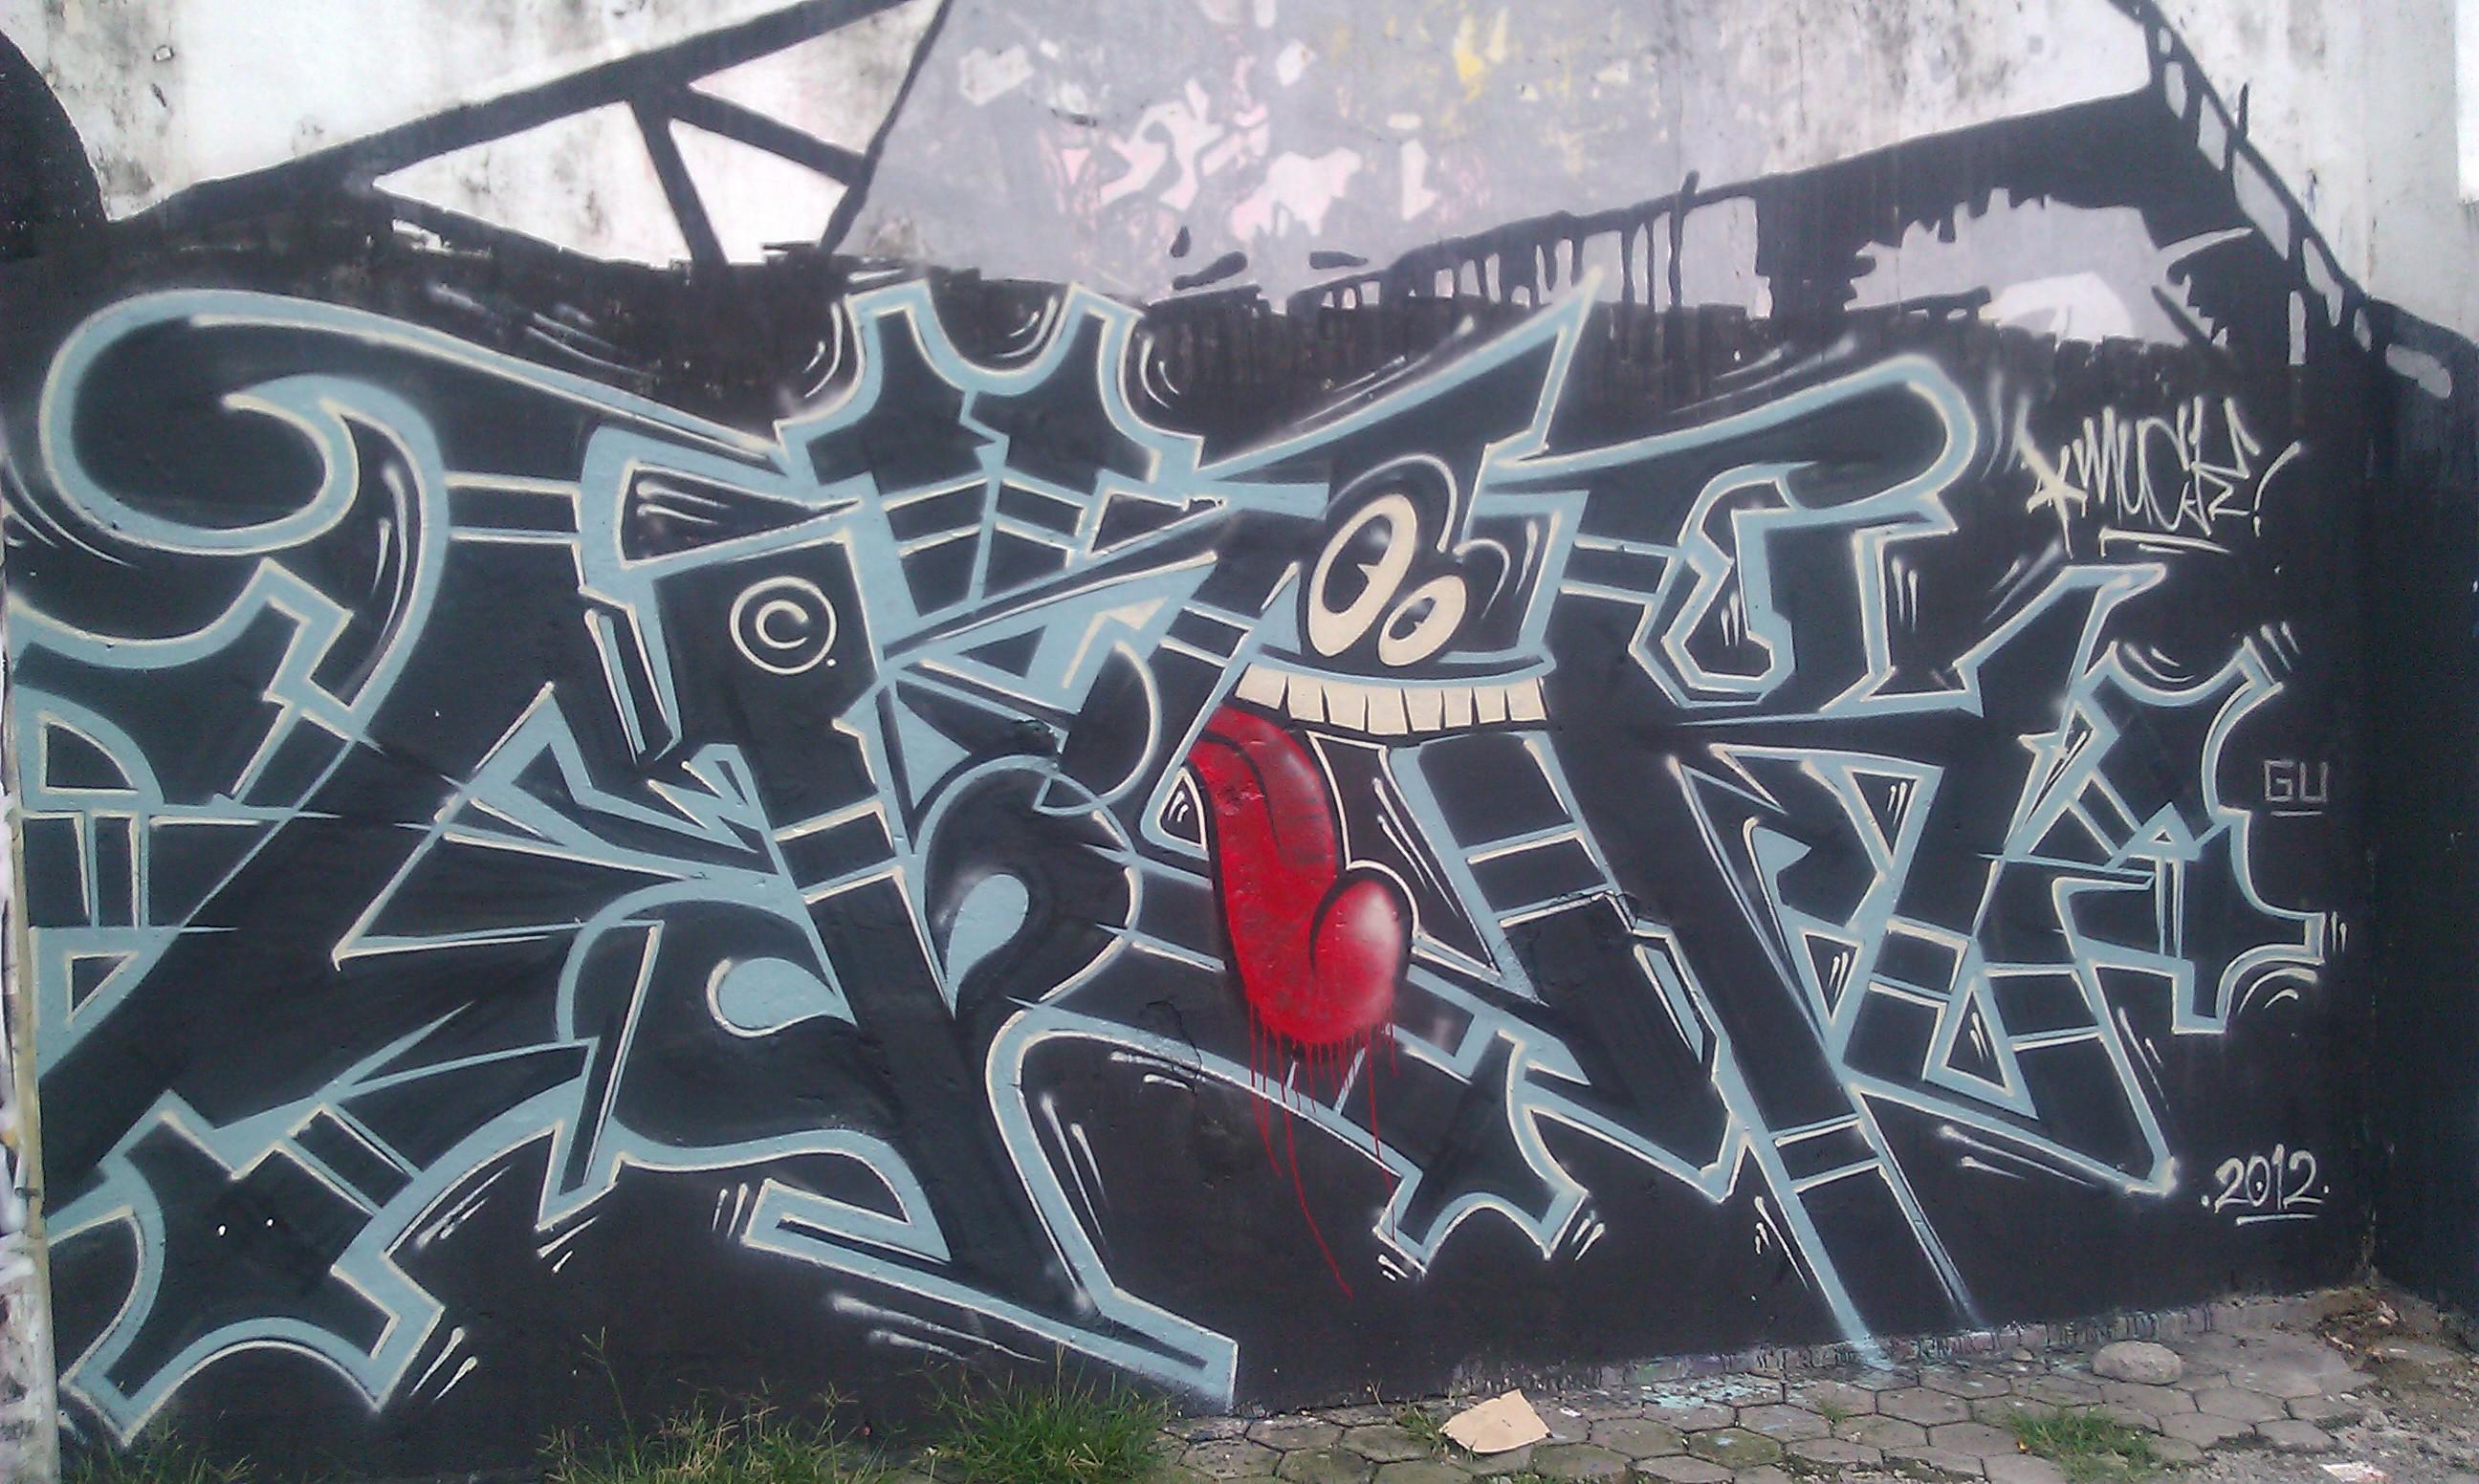 Filegraffiti in yogyakarta indonesia feb 2012 06 jpg